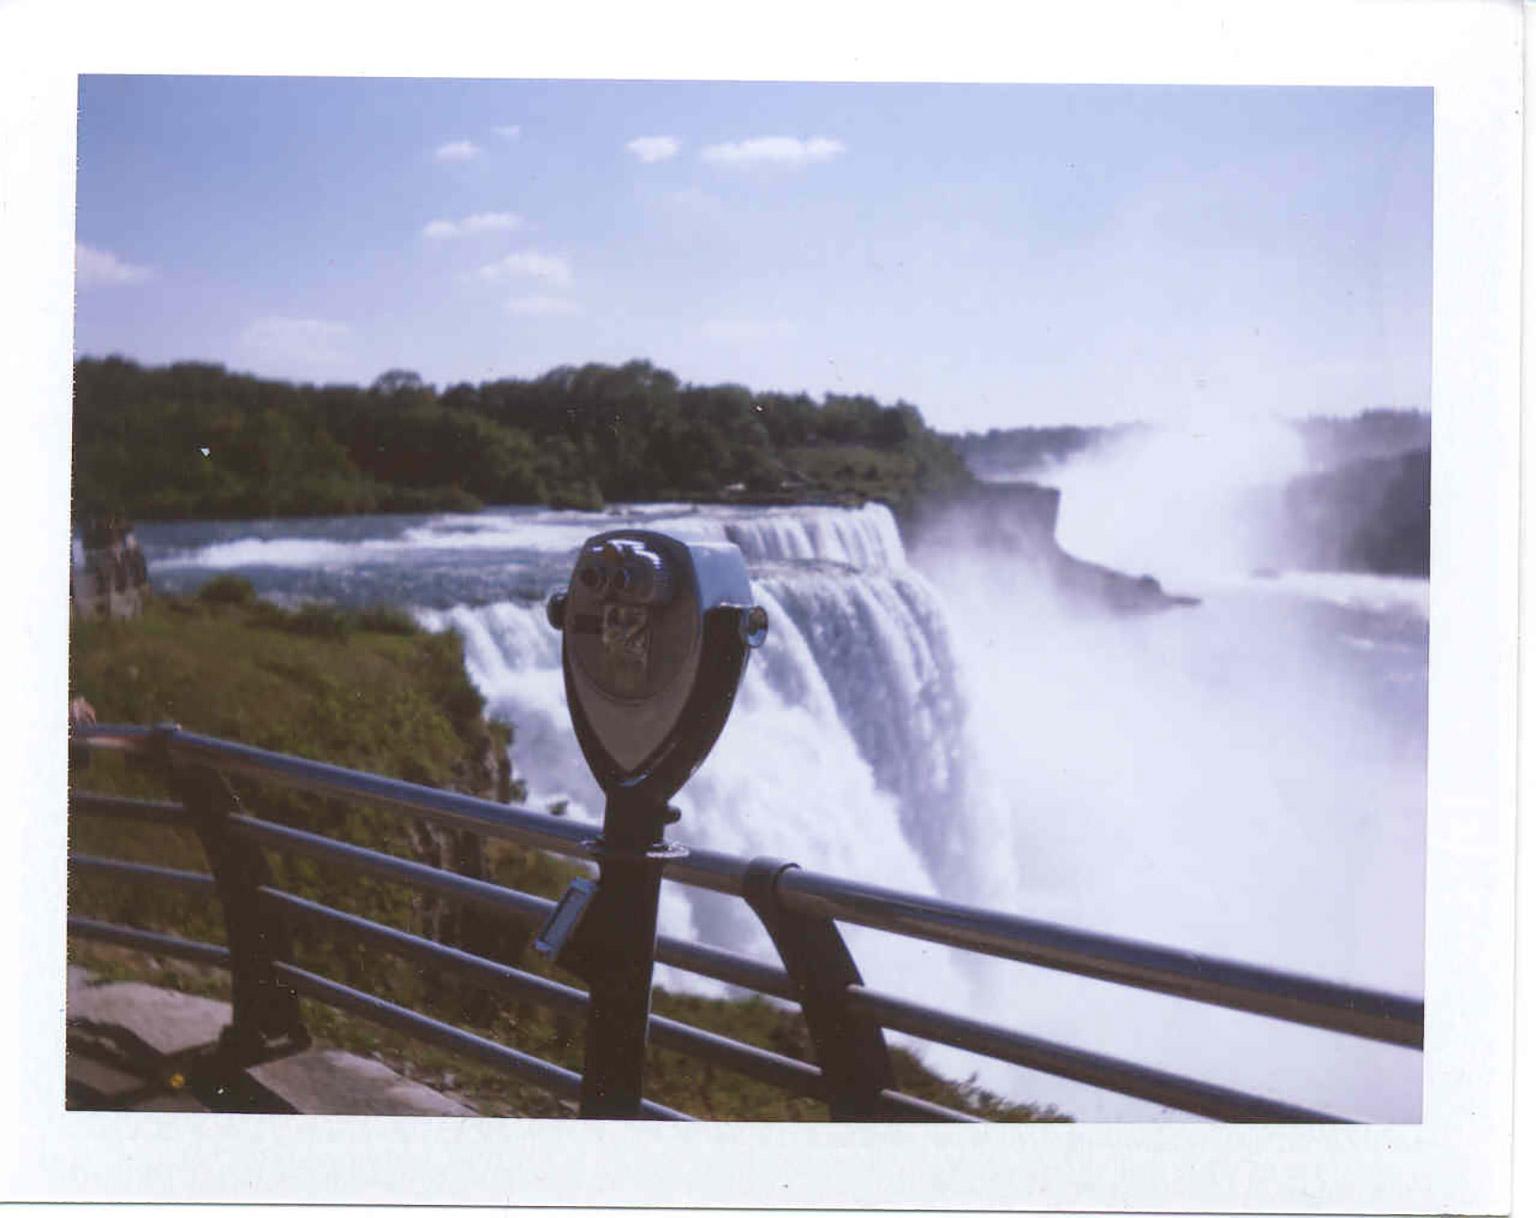 falls+viewfinder